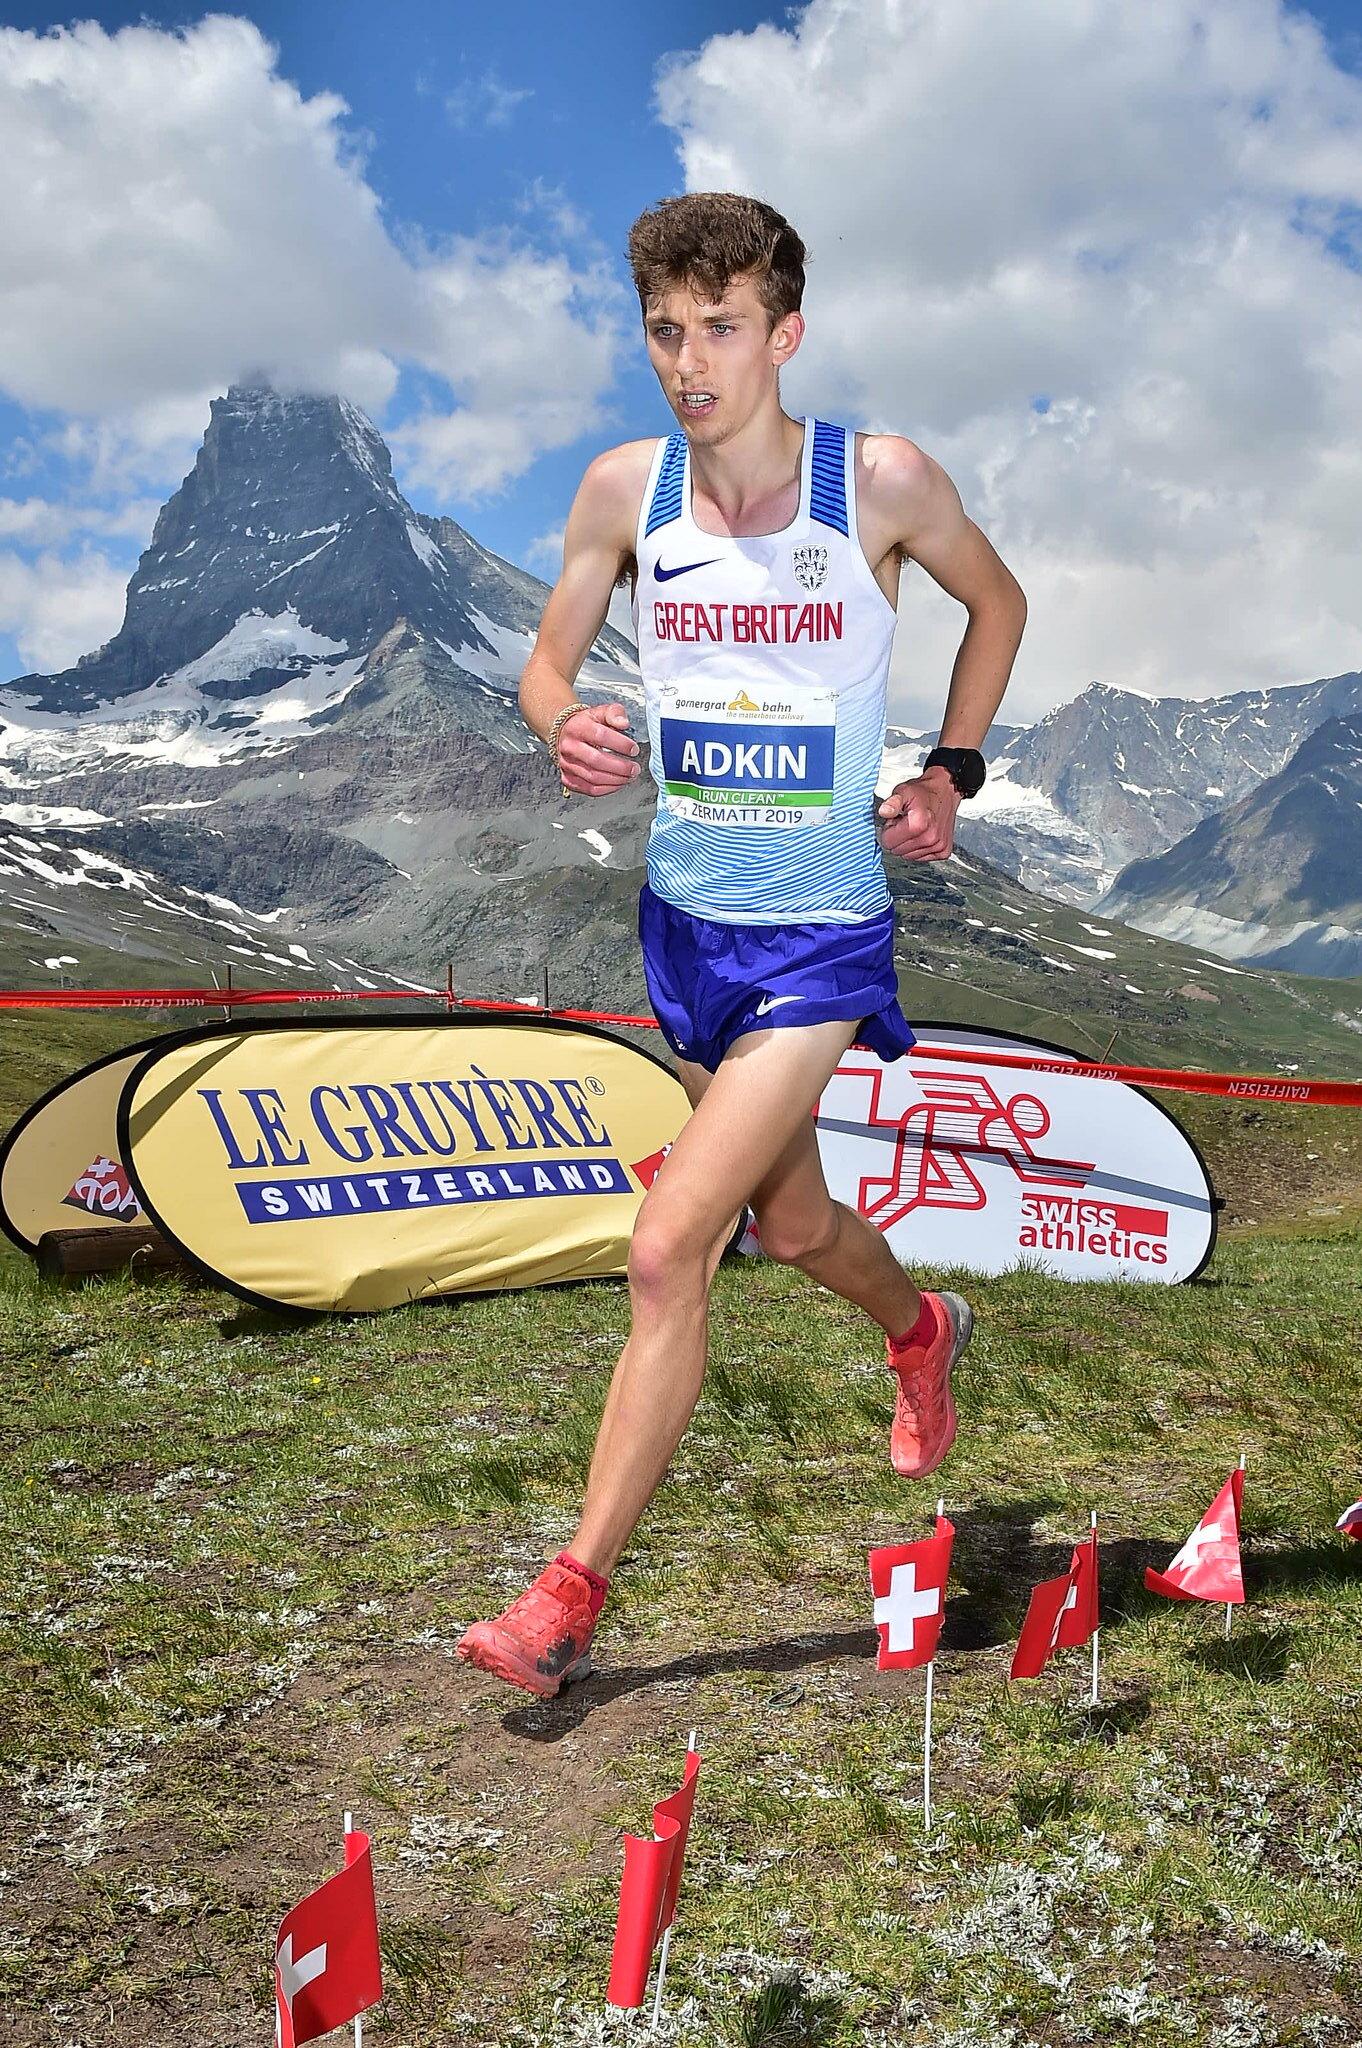 Winner Jacob Adkin (Credit: European Mountain Running Championships 2019)